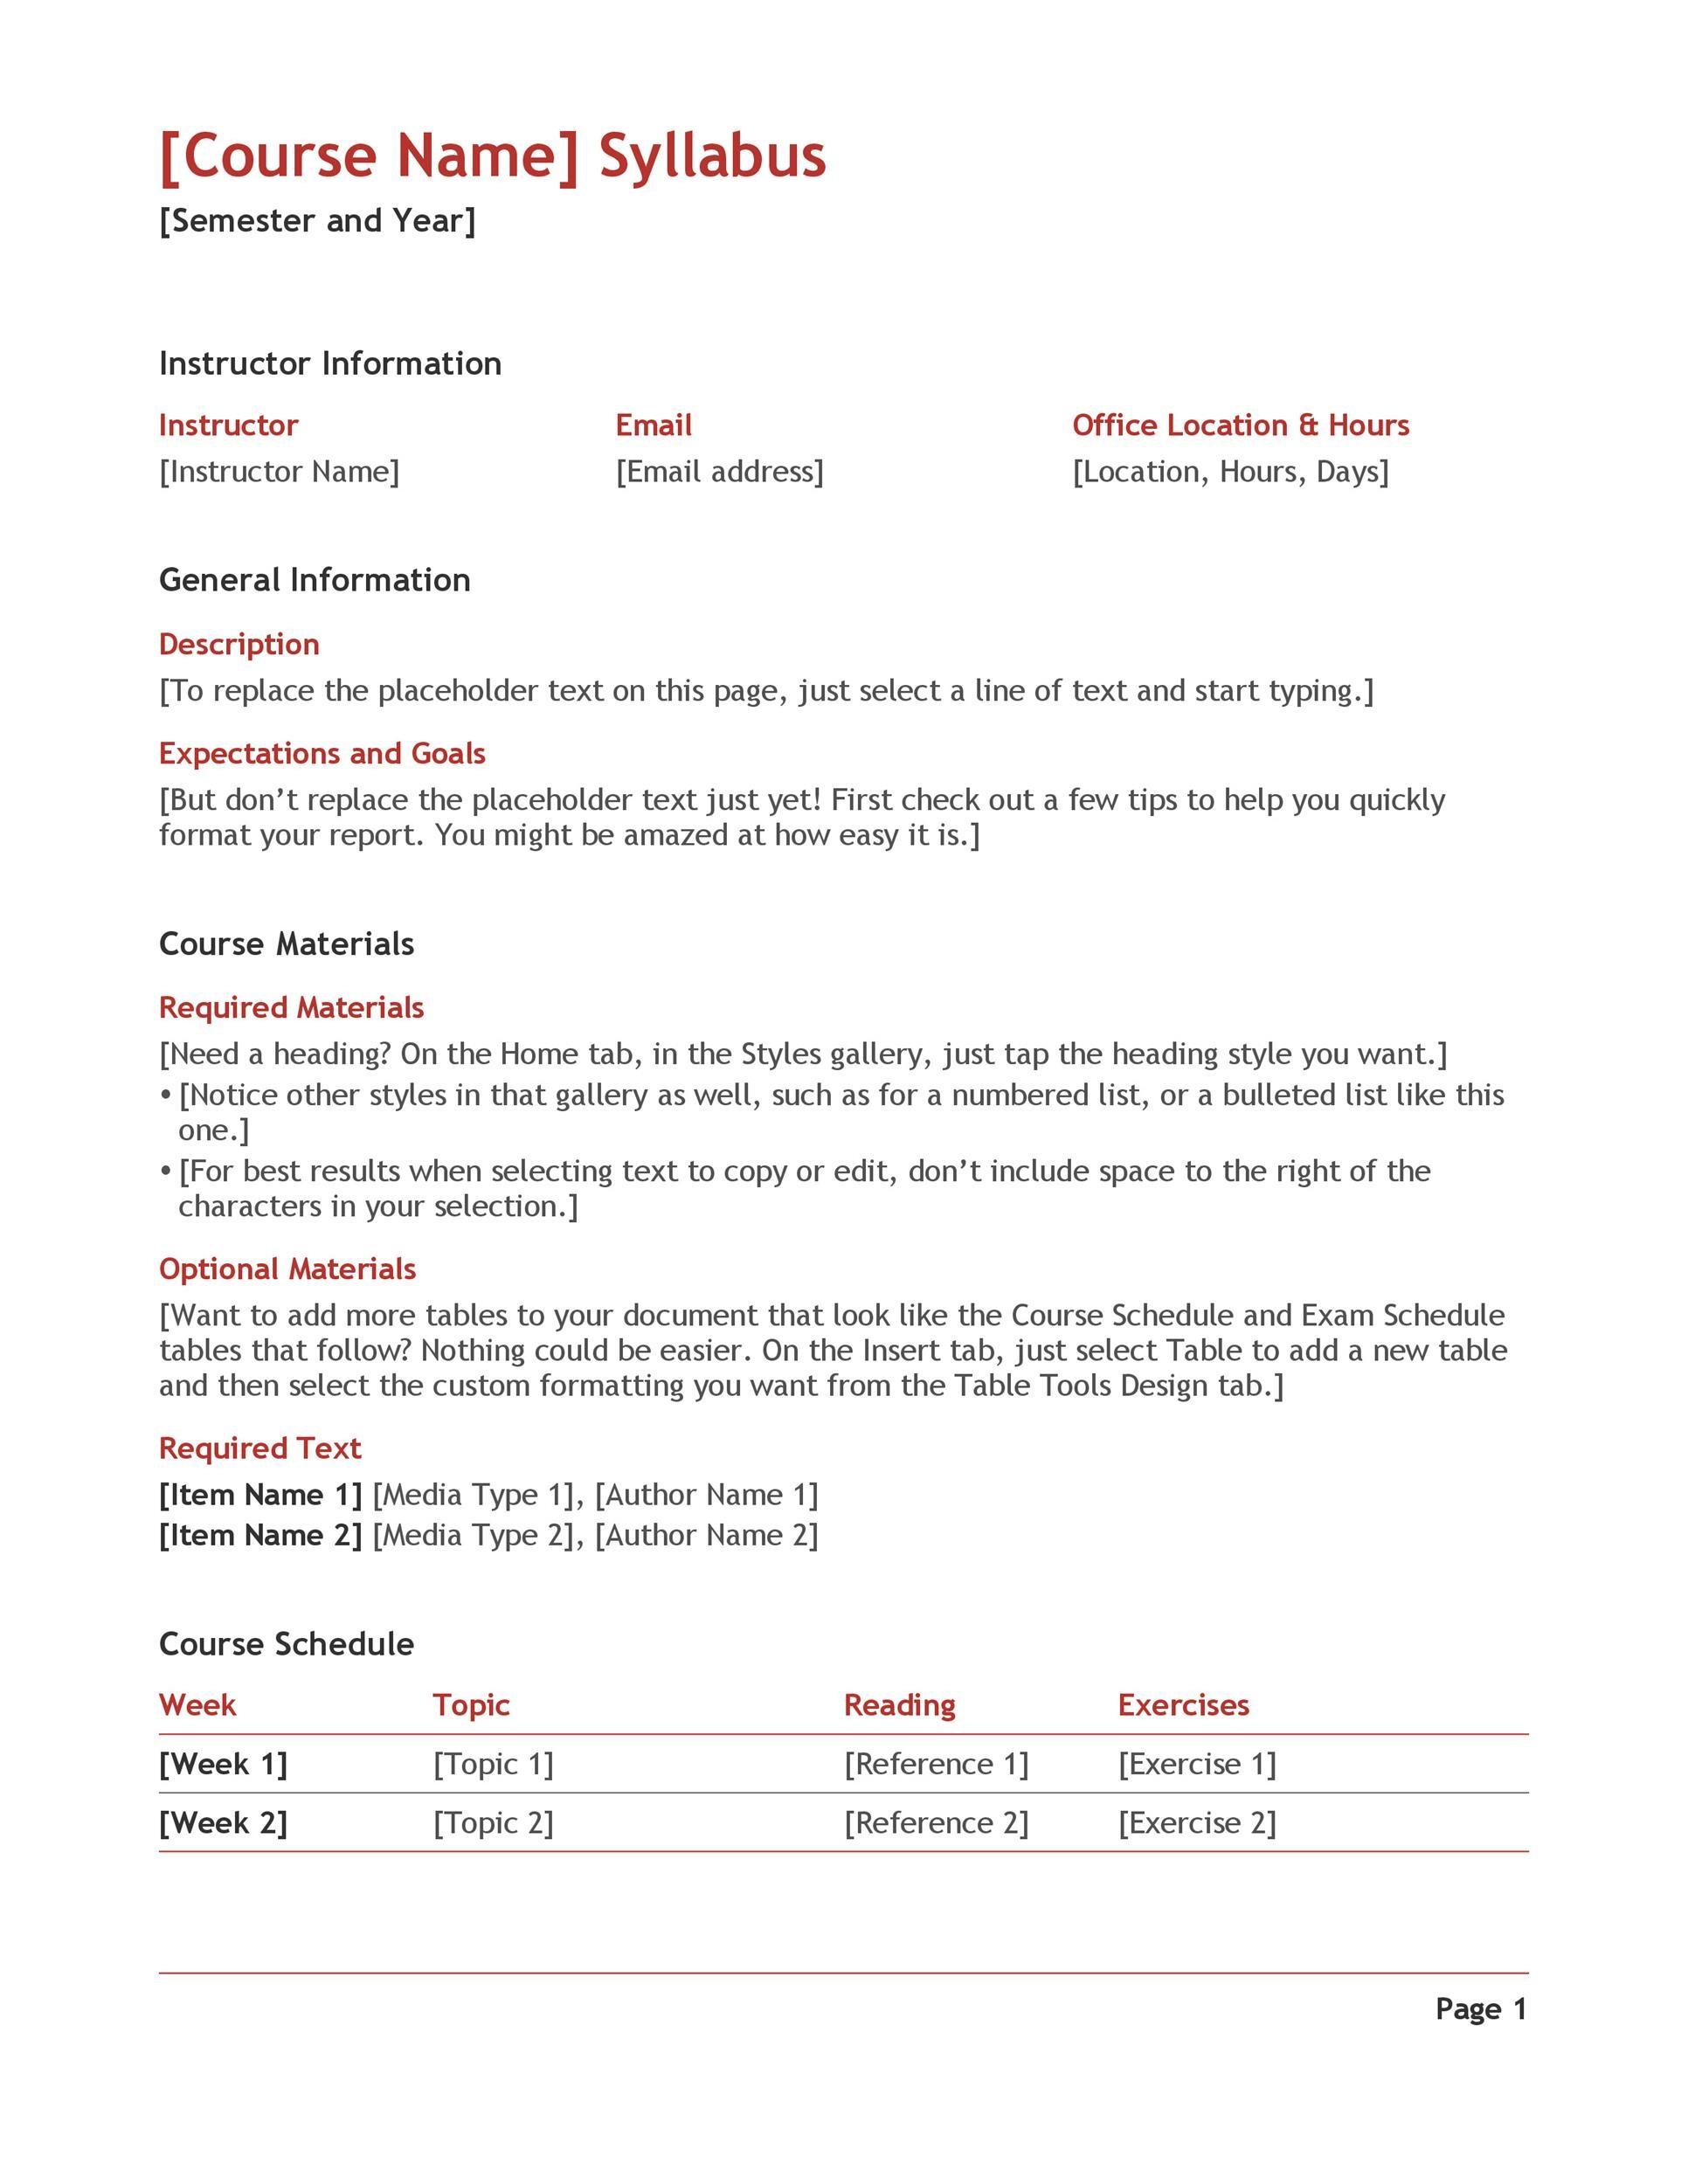 Free sylabus template 04